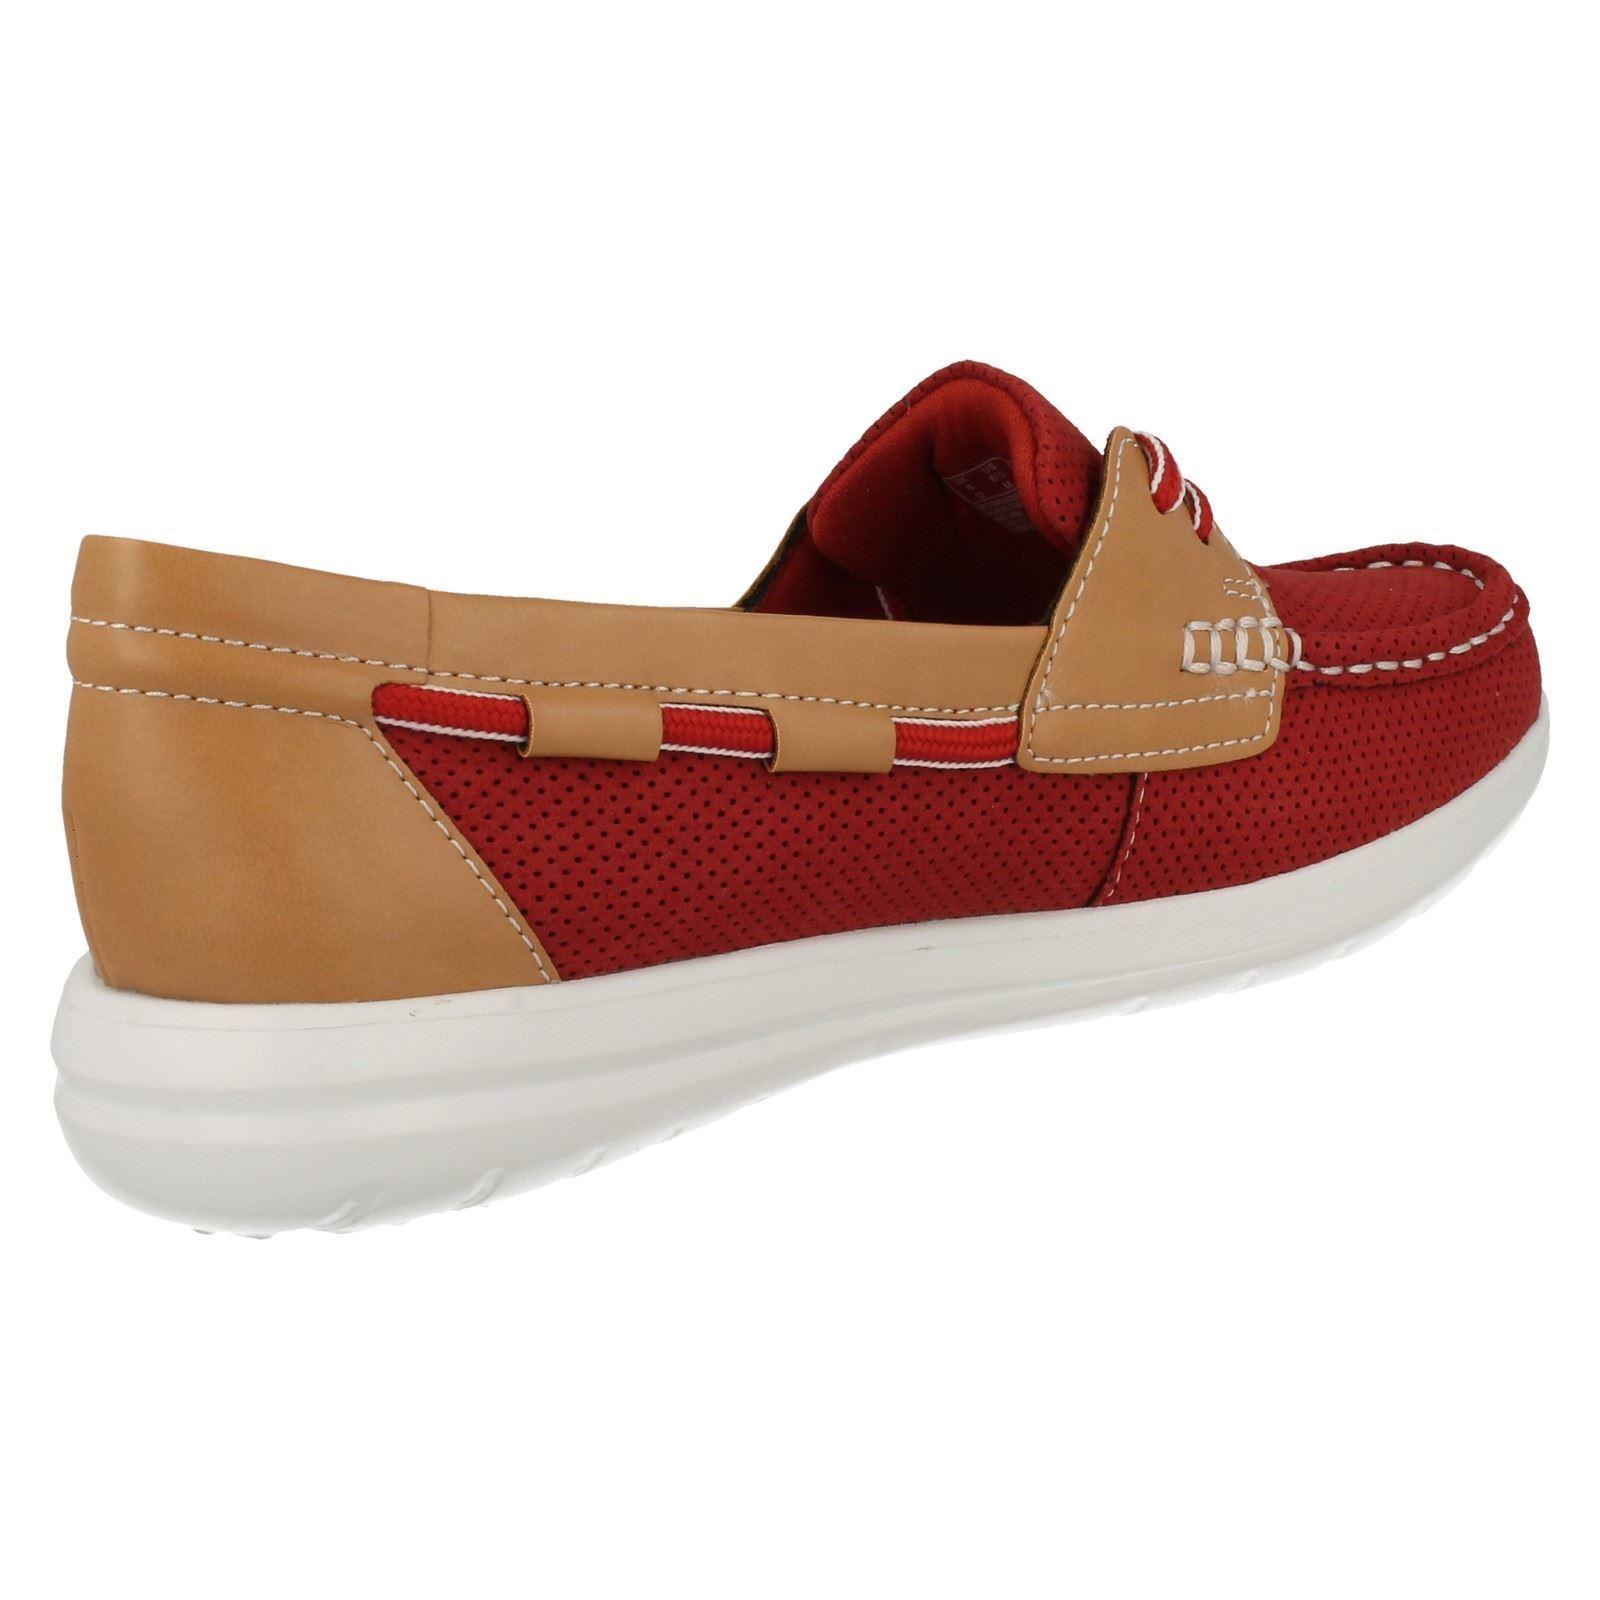 Deck Shoes Ladies Ebay Uk